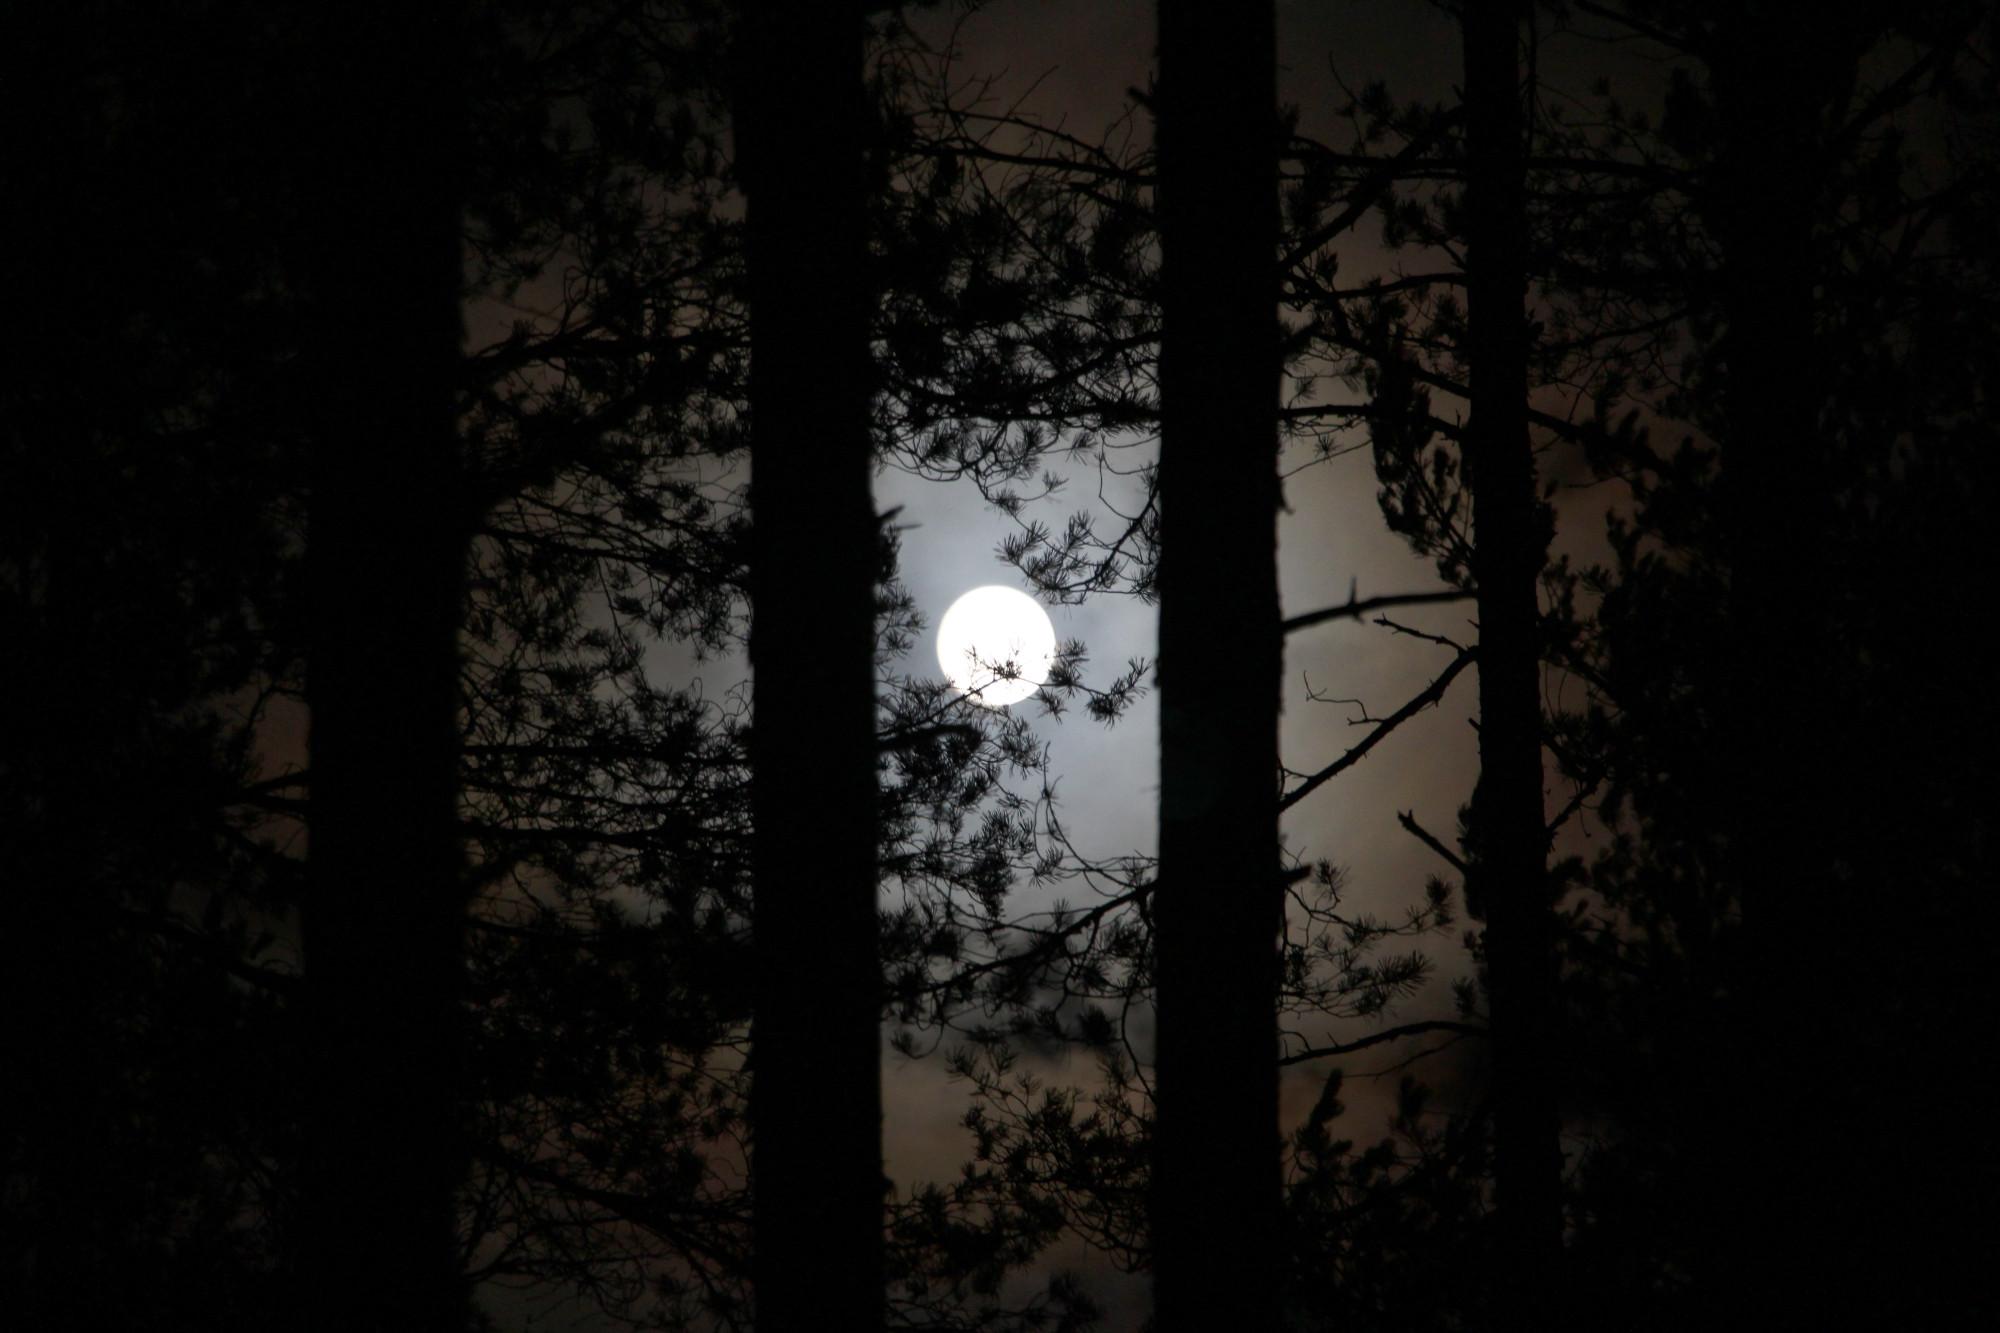 ёлки деревья лес ночь луна